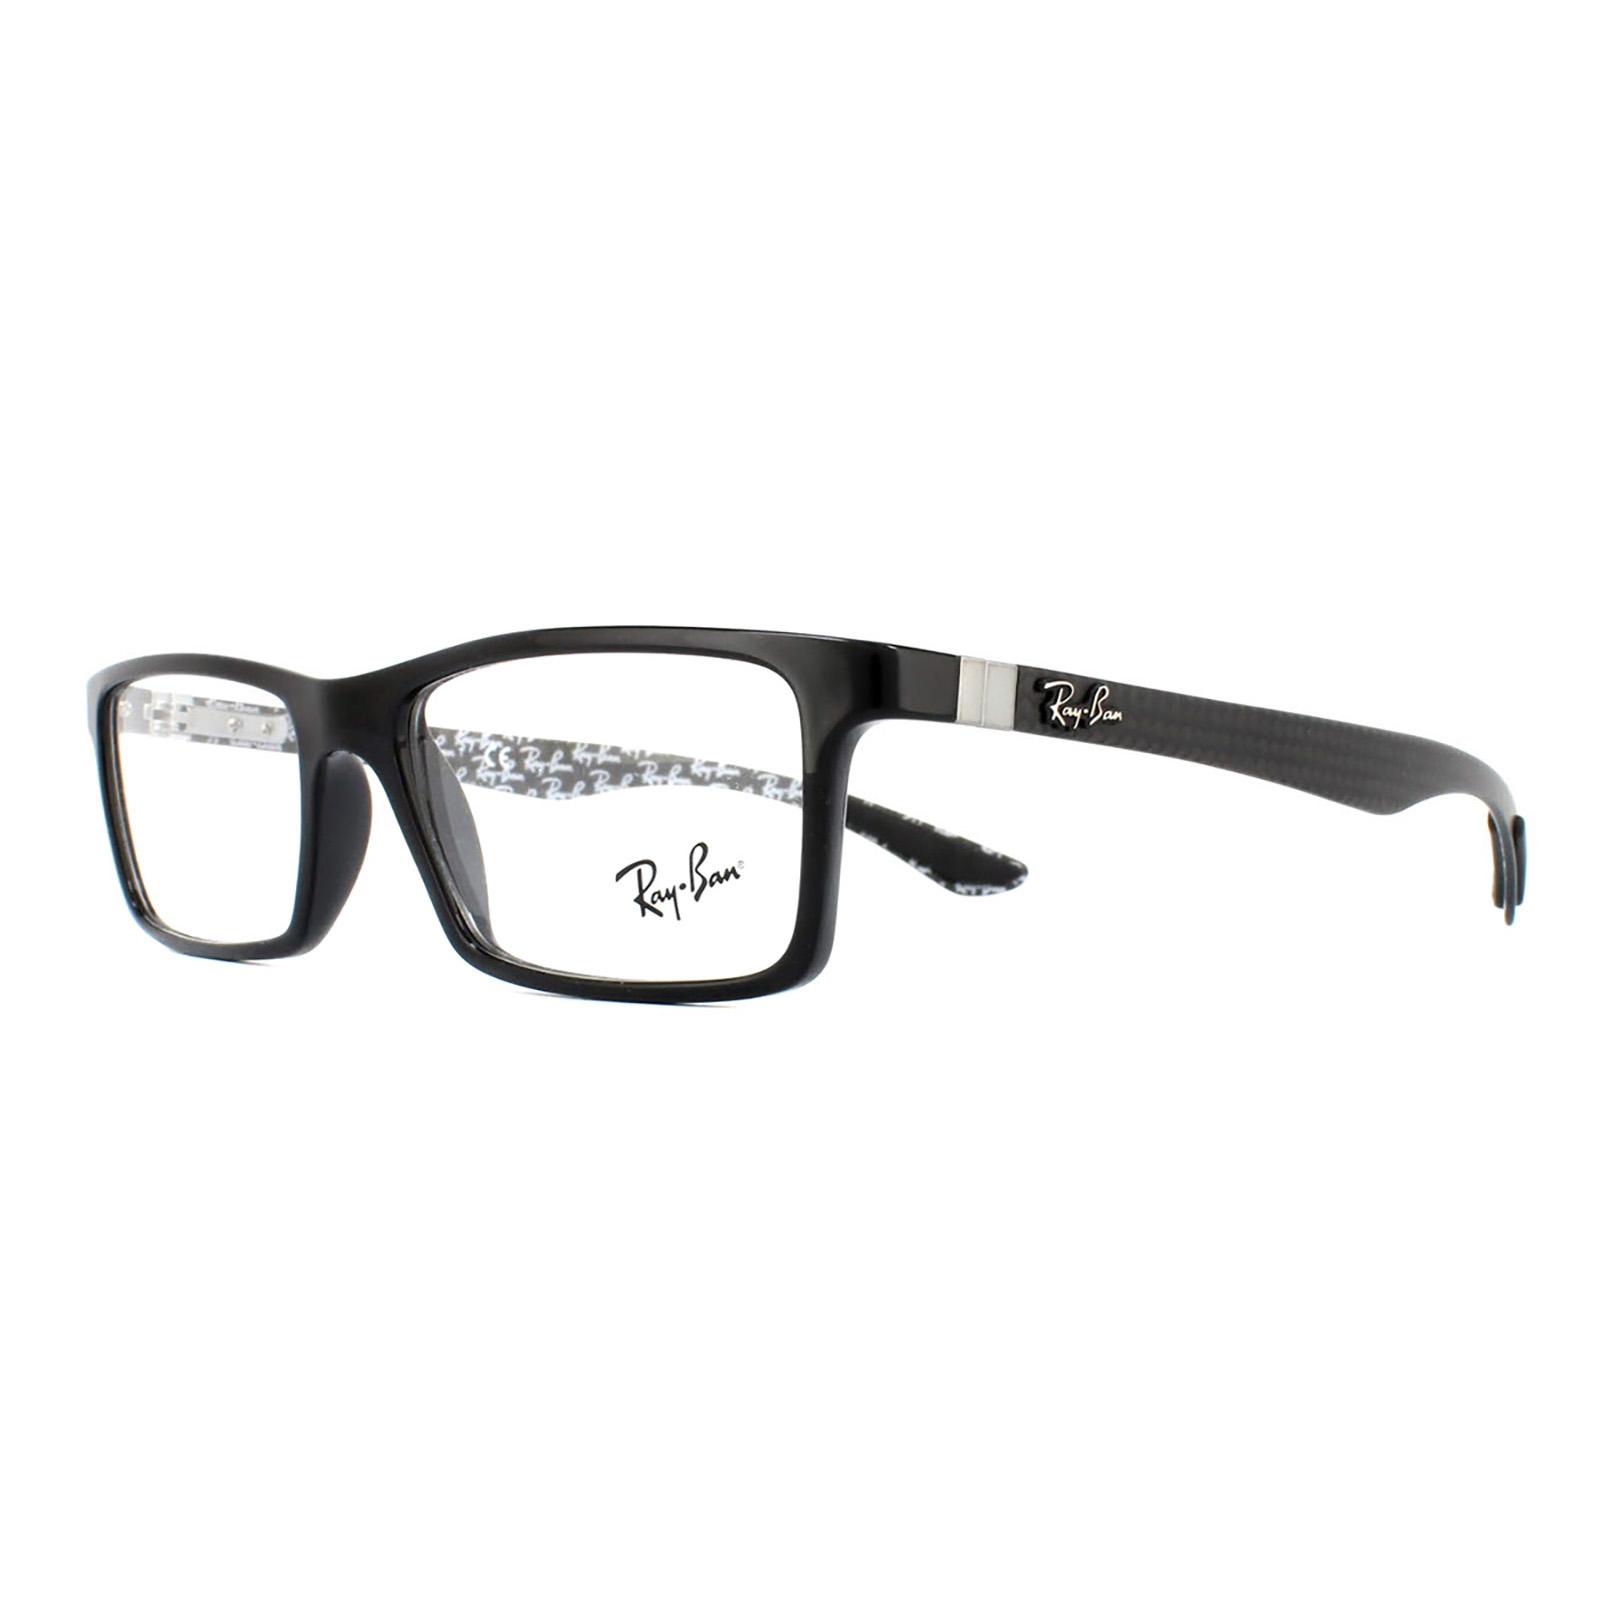 407266db46 Sentinel Ray-Ban Glasses Frames 8901 5610 Black On Shiny Grey 55mm